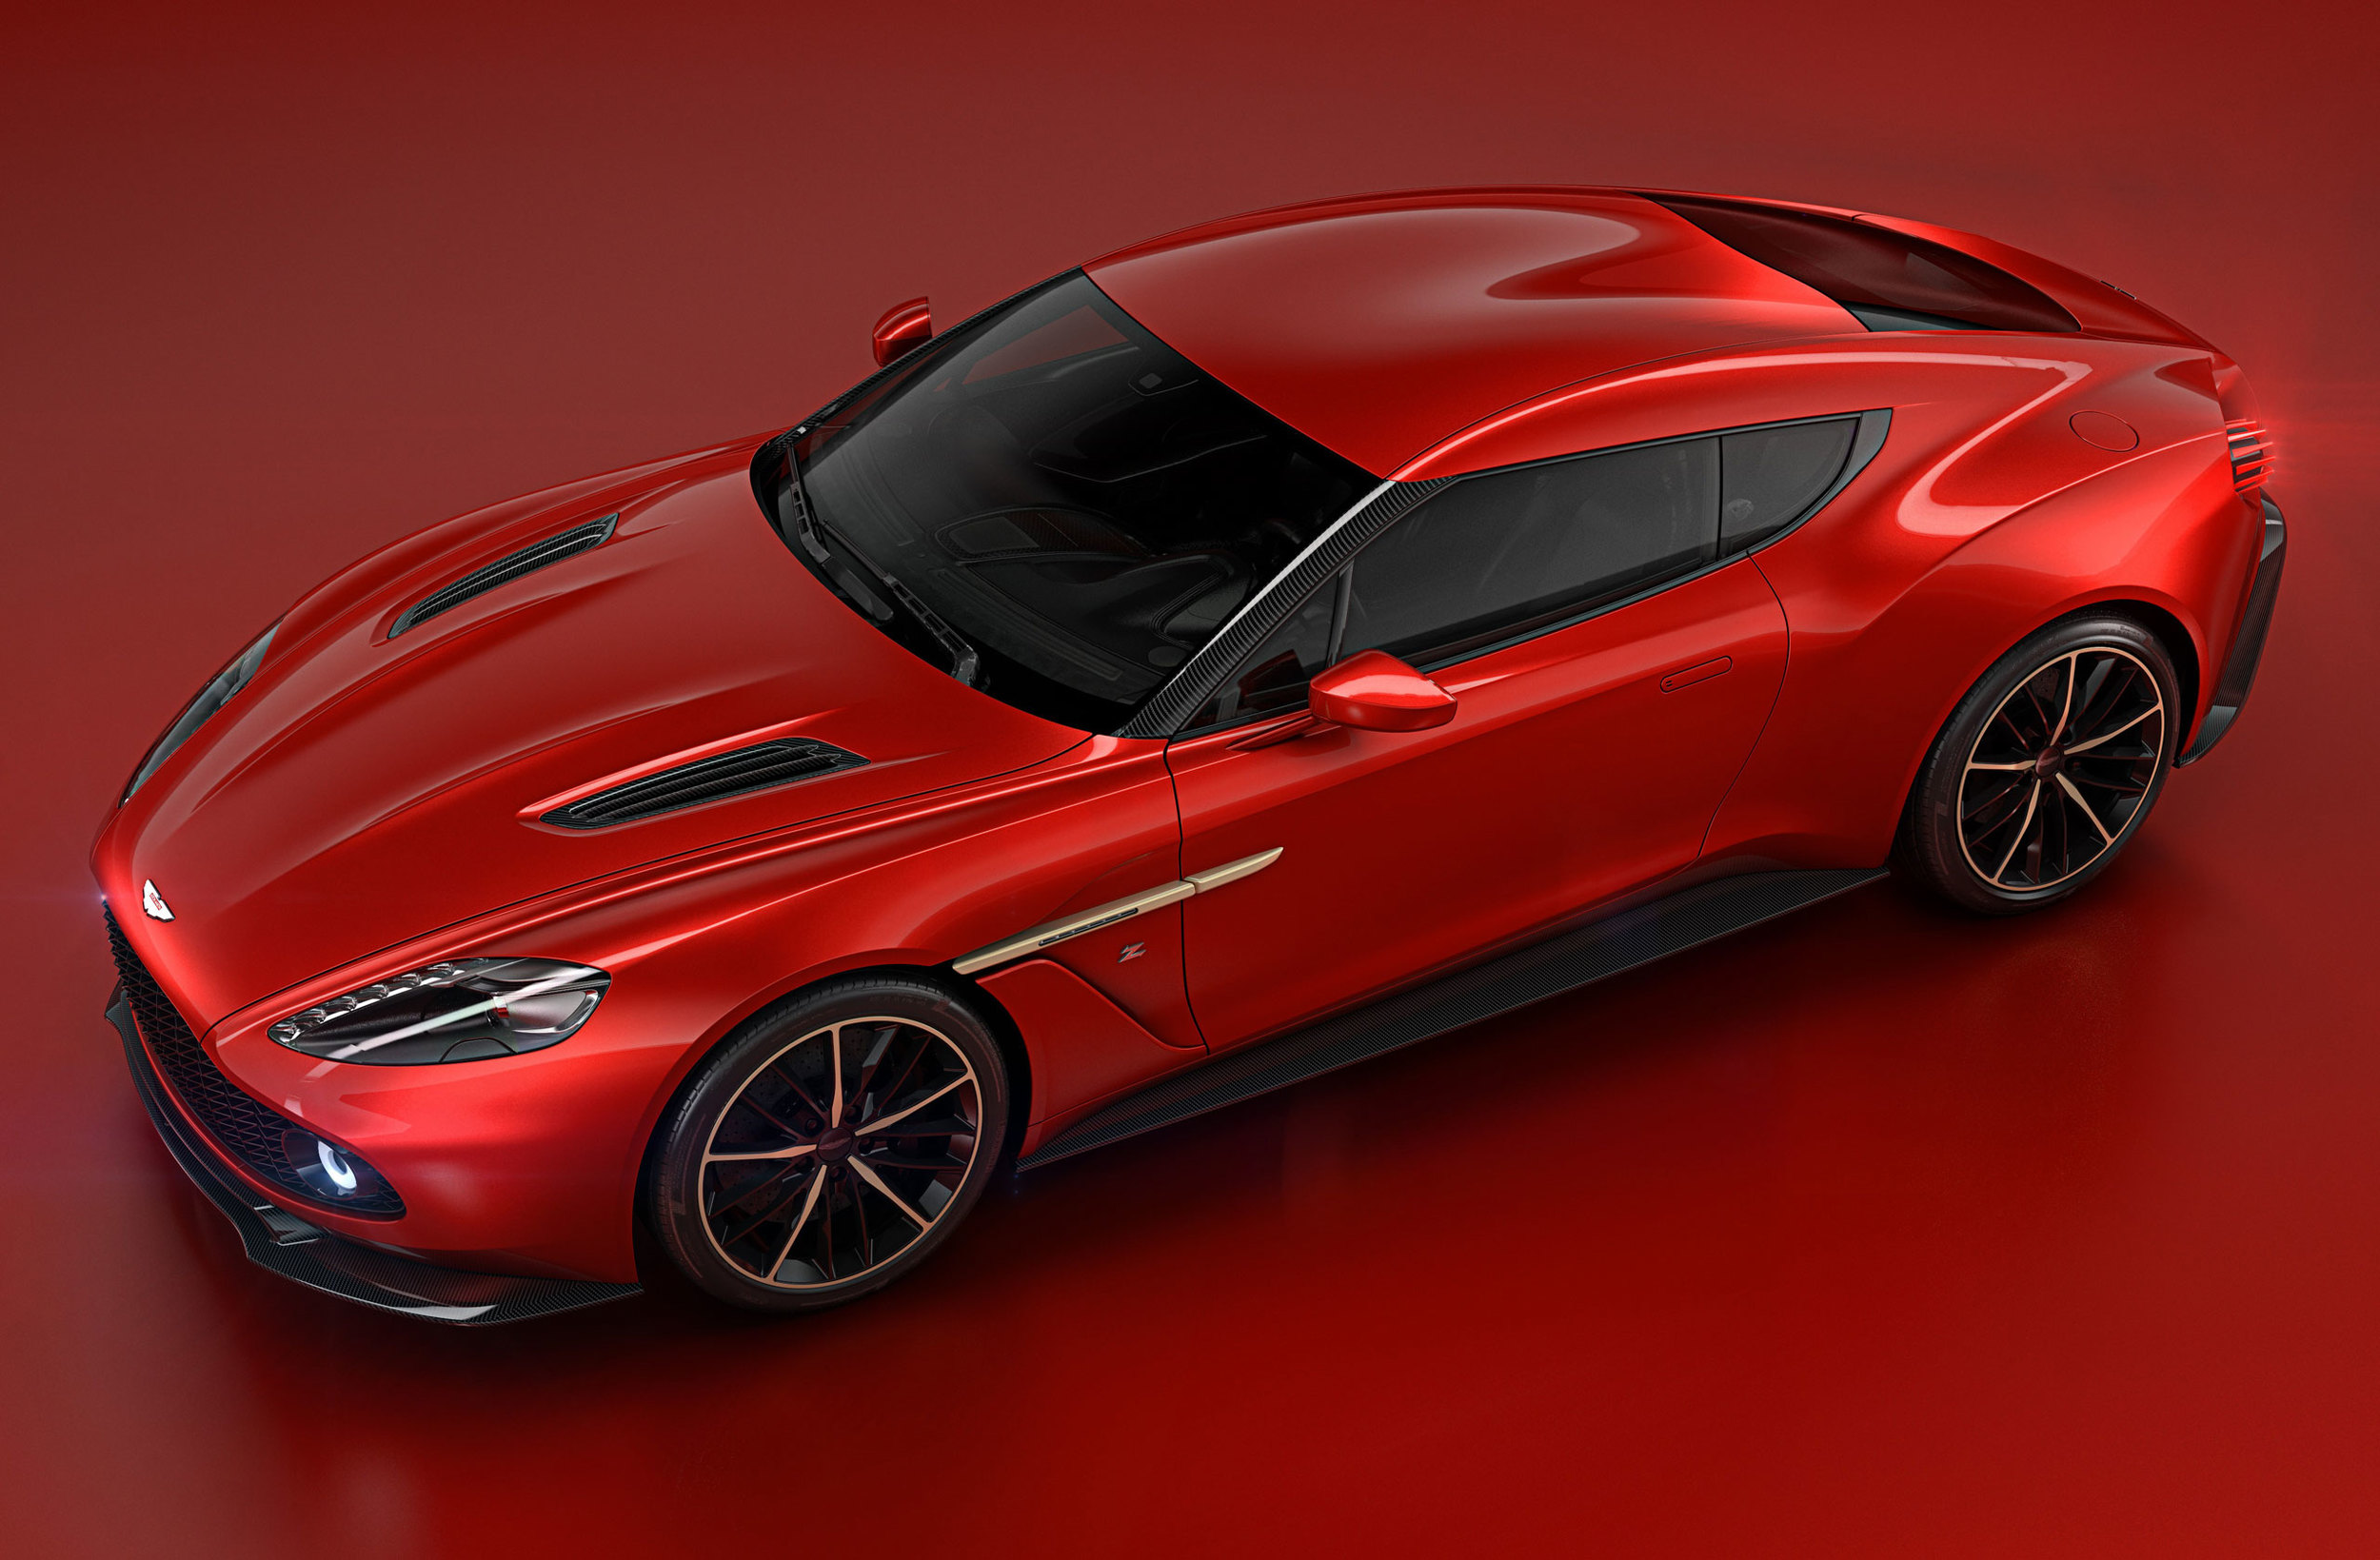 Aston-Martin-Vanquish-Zagato-Concept_08.jpg